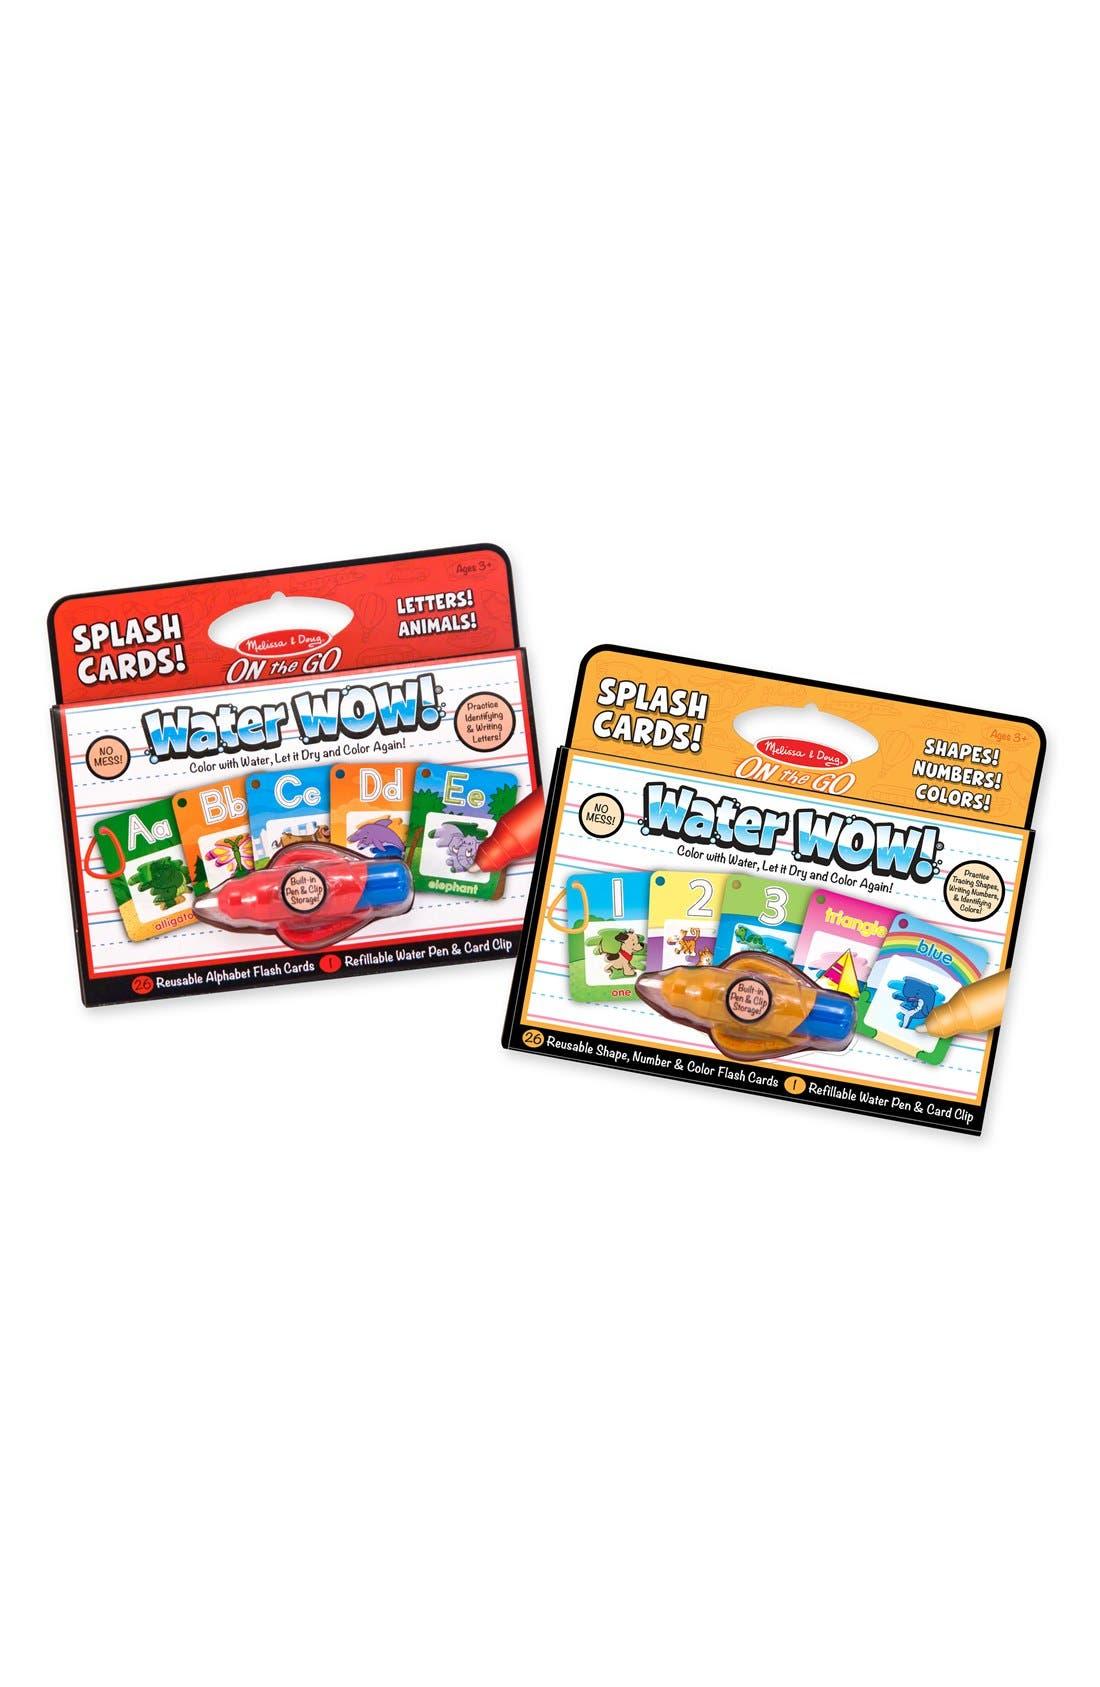 Alternate Image 1 Selected - Melissa & Doug 'Water WOW!' Splash Cards Set